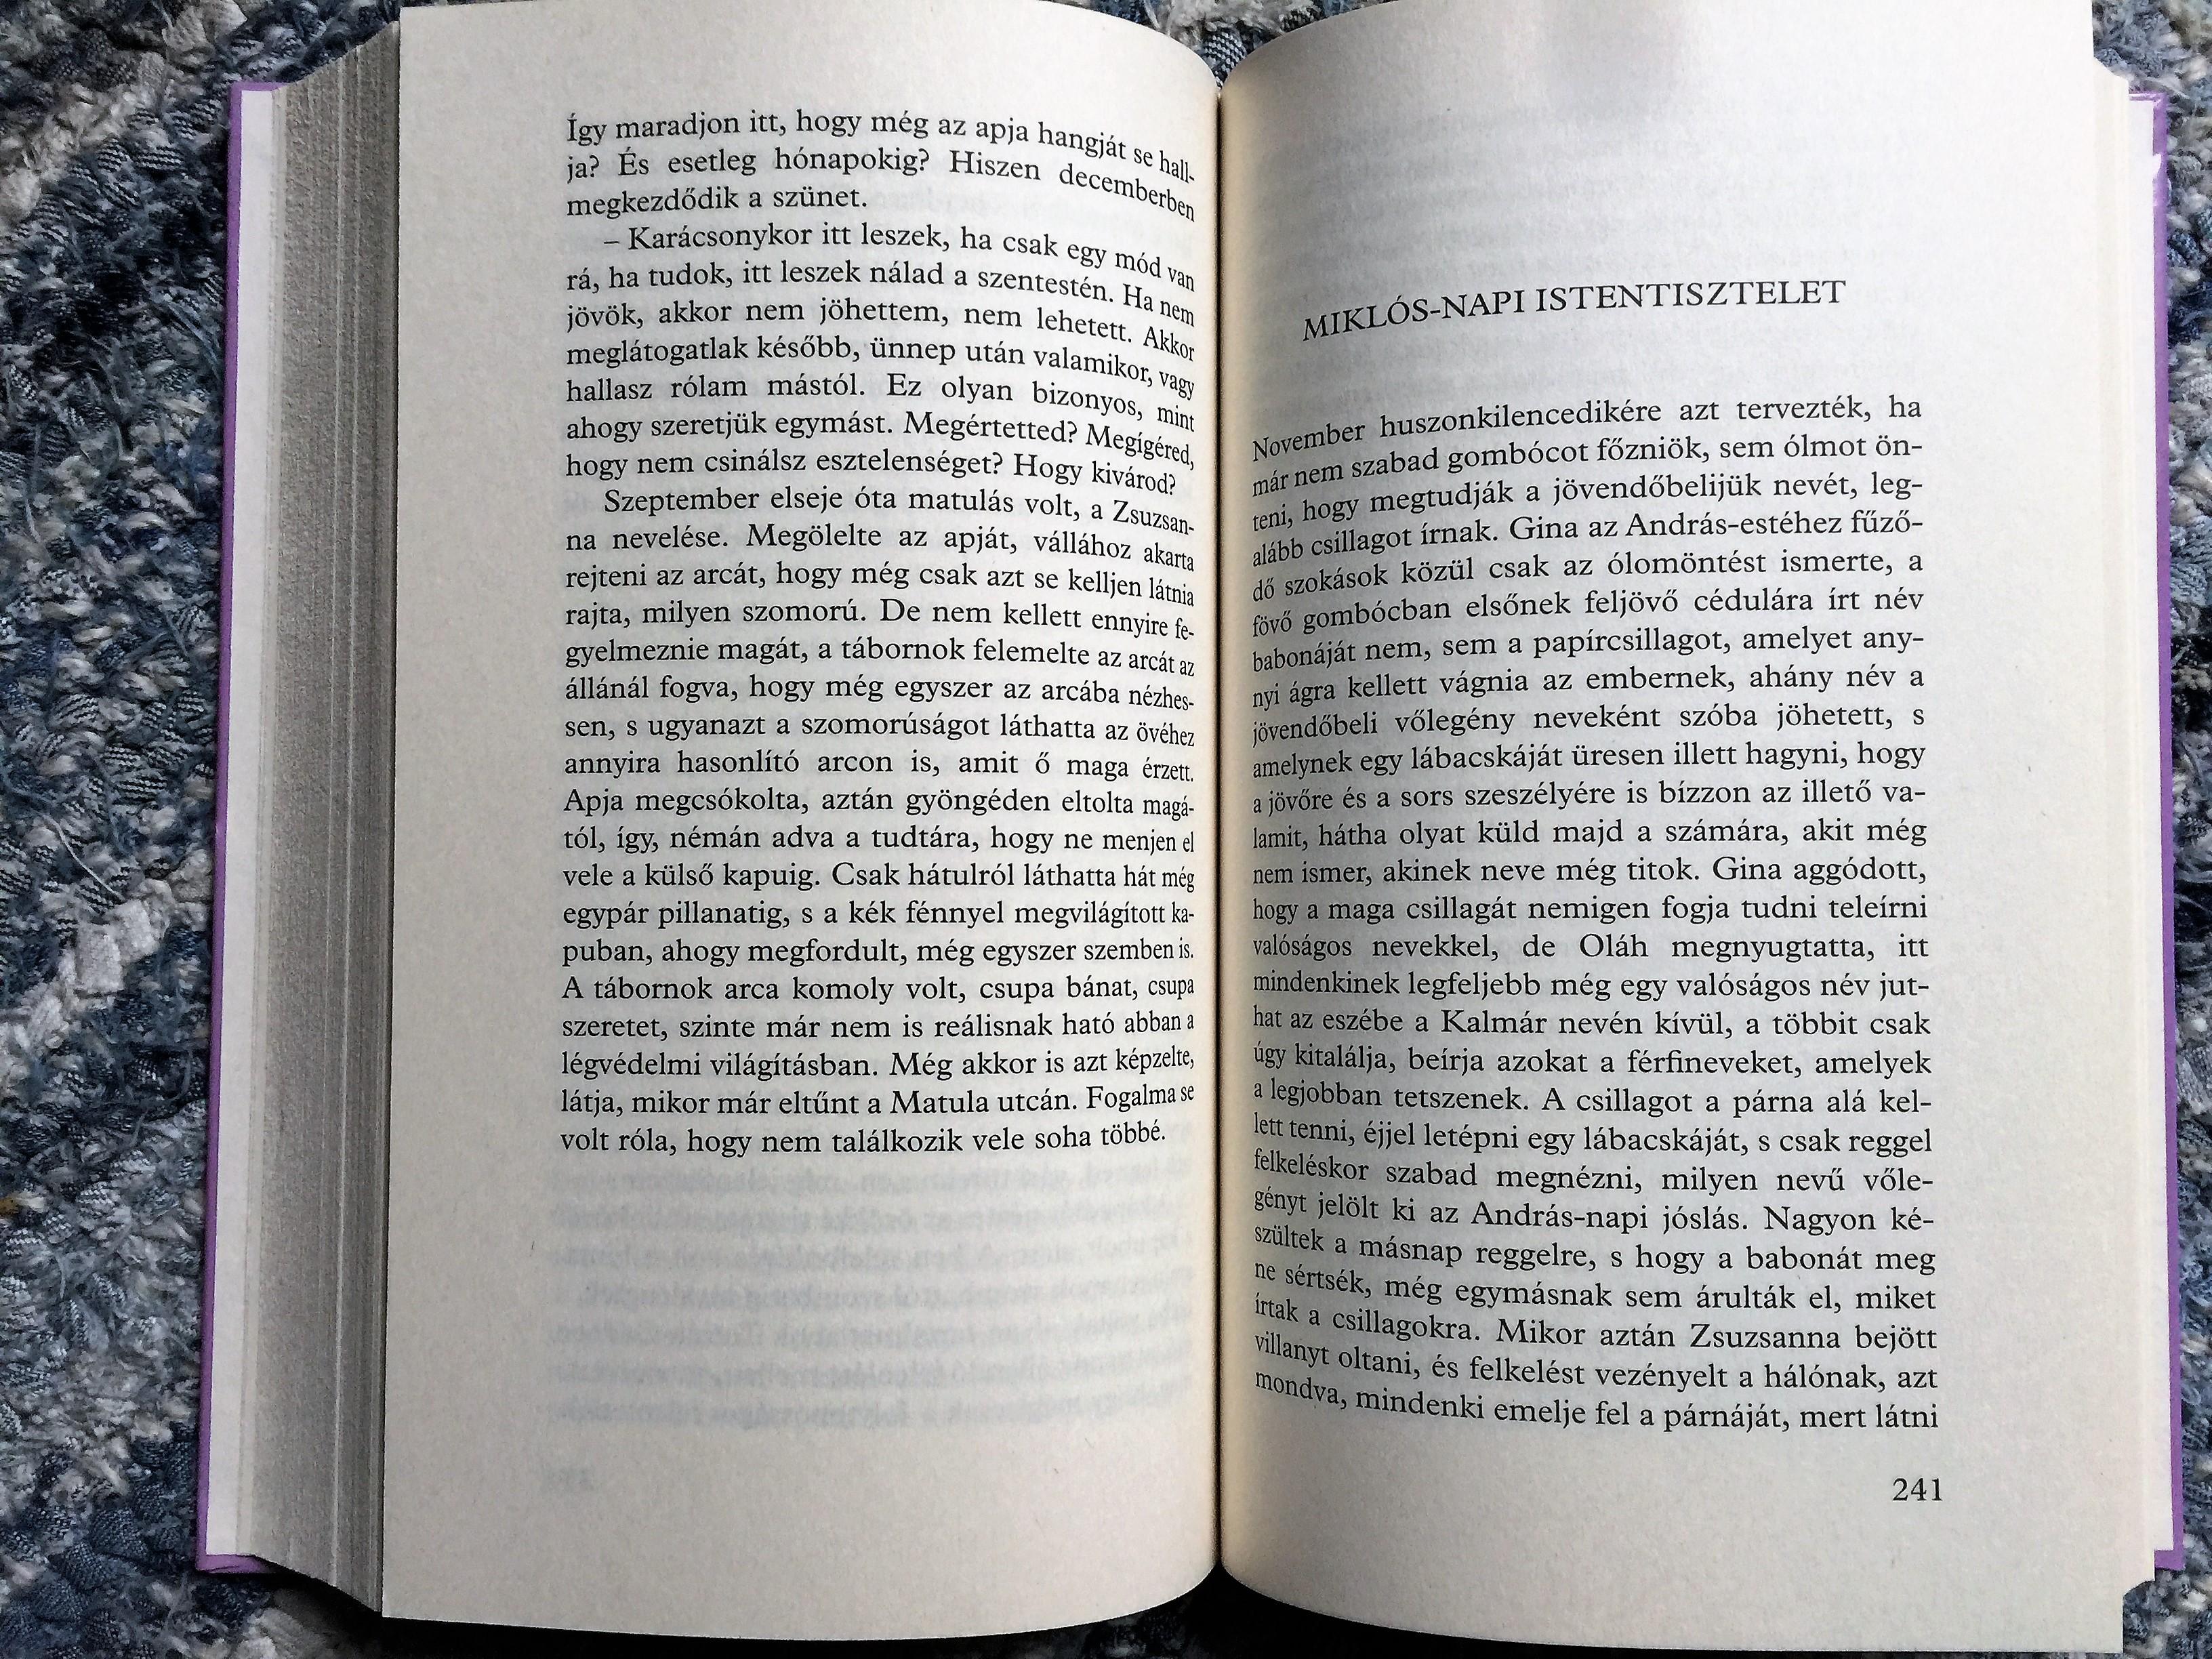 img-3626.jpg